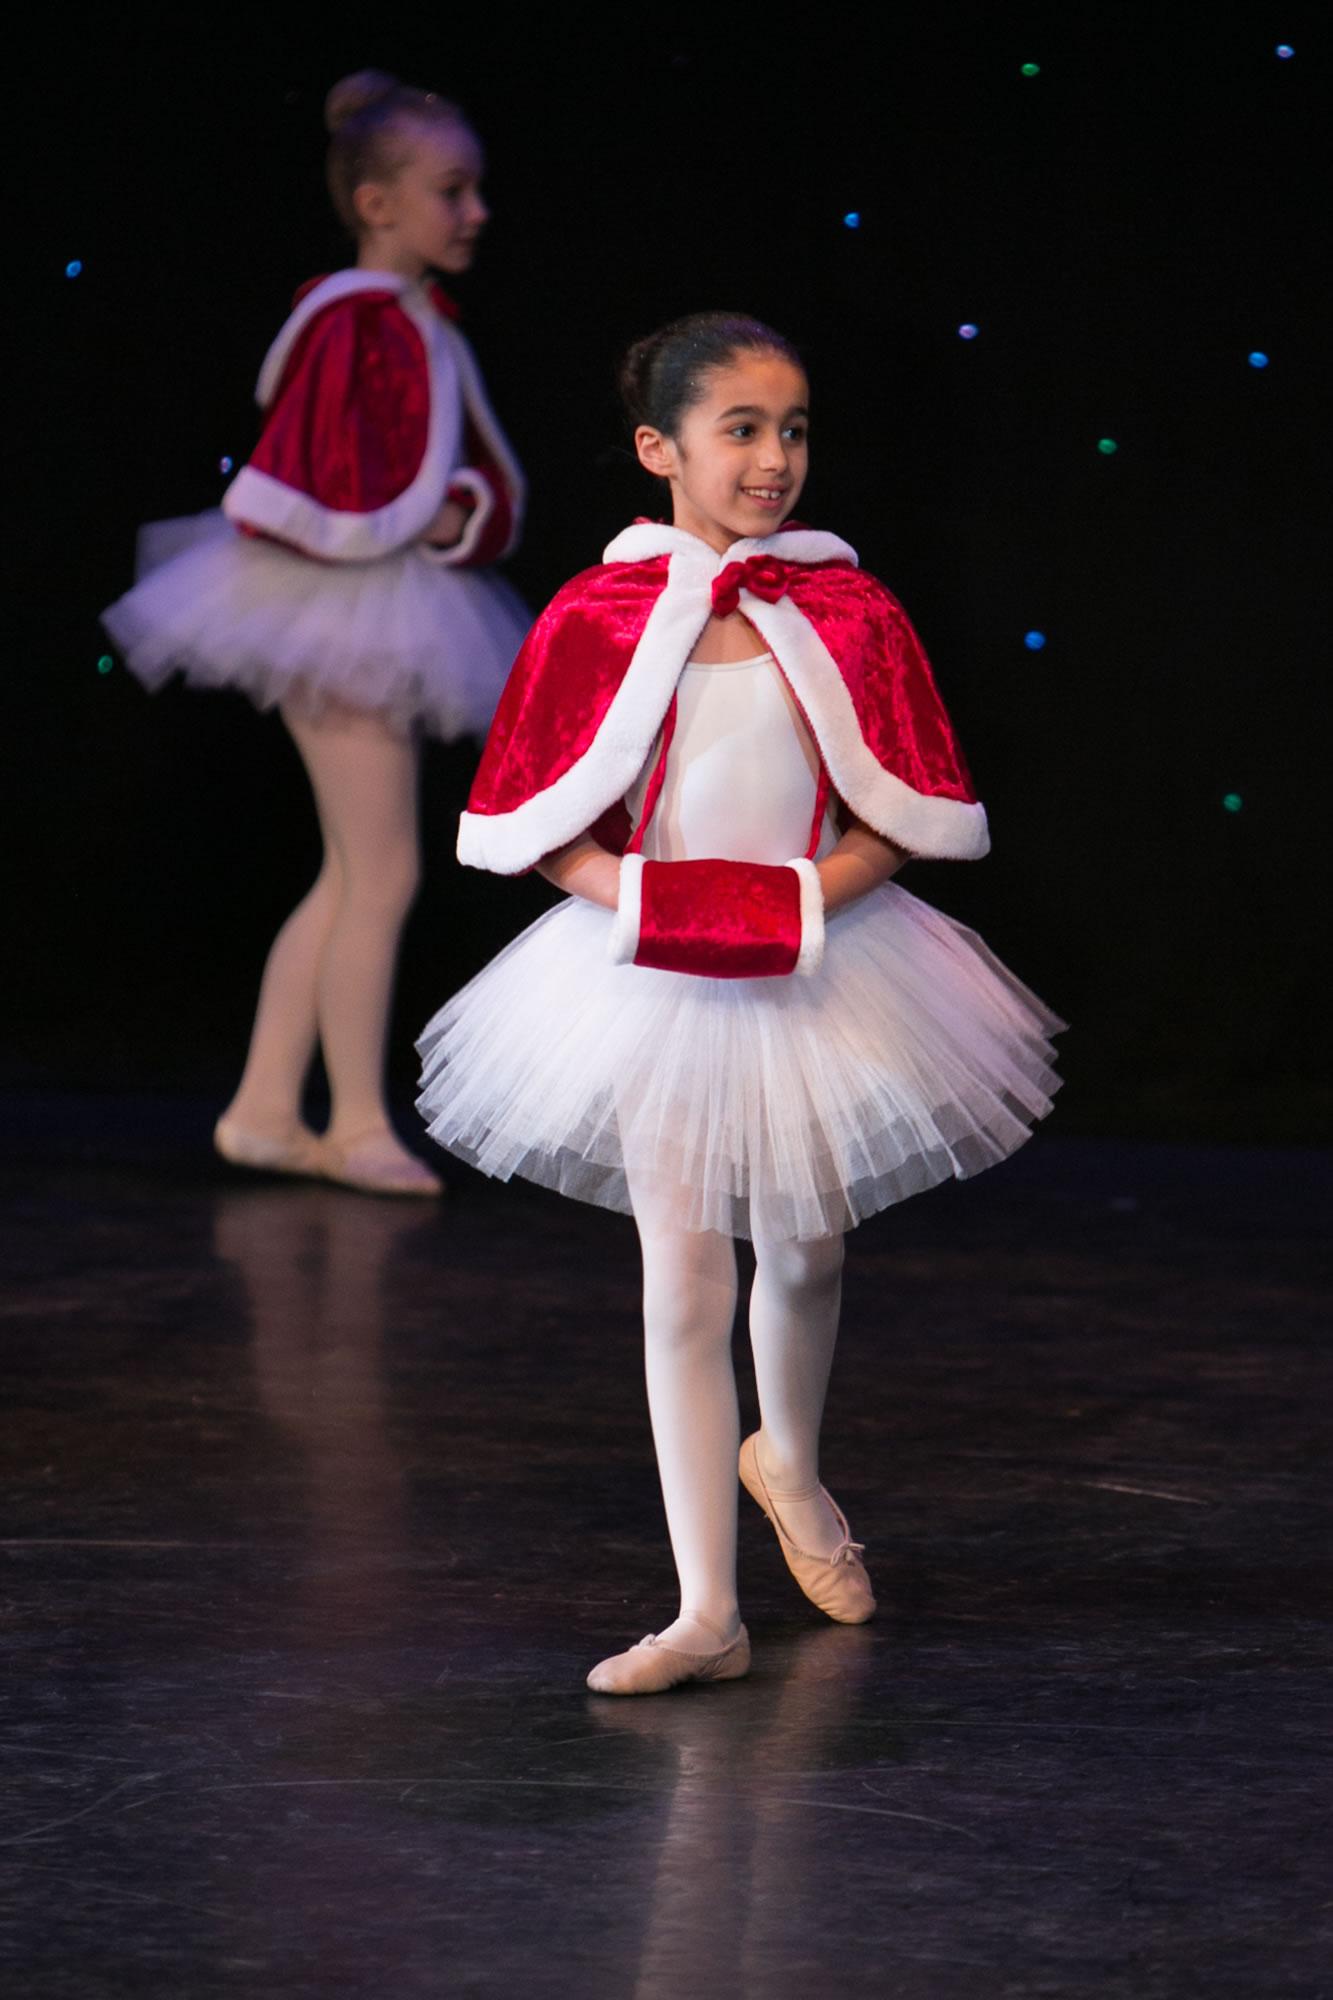 Hitchin_School_of_Dance_Show_2019-SM1_1941.jpg